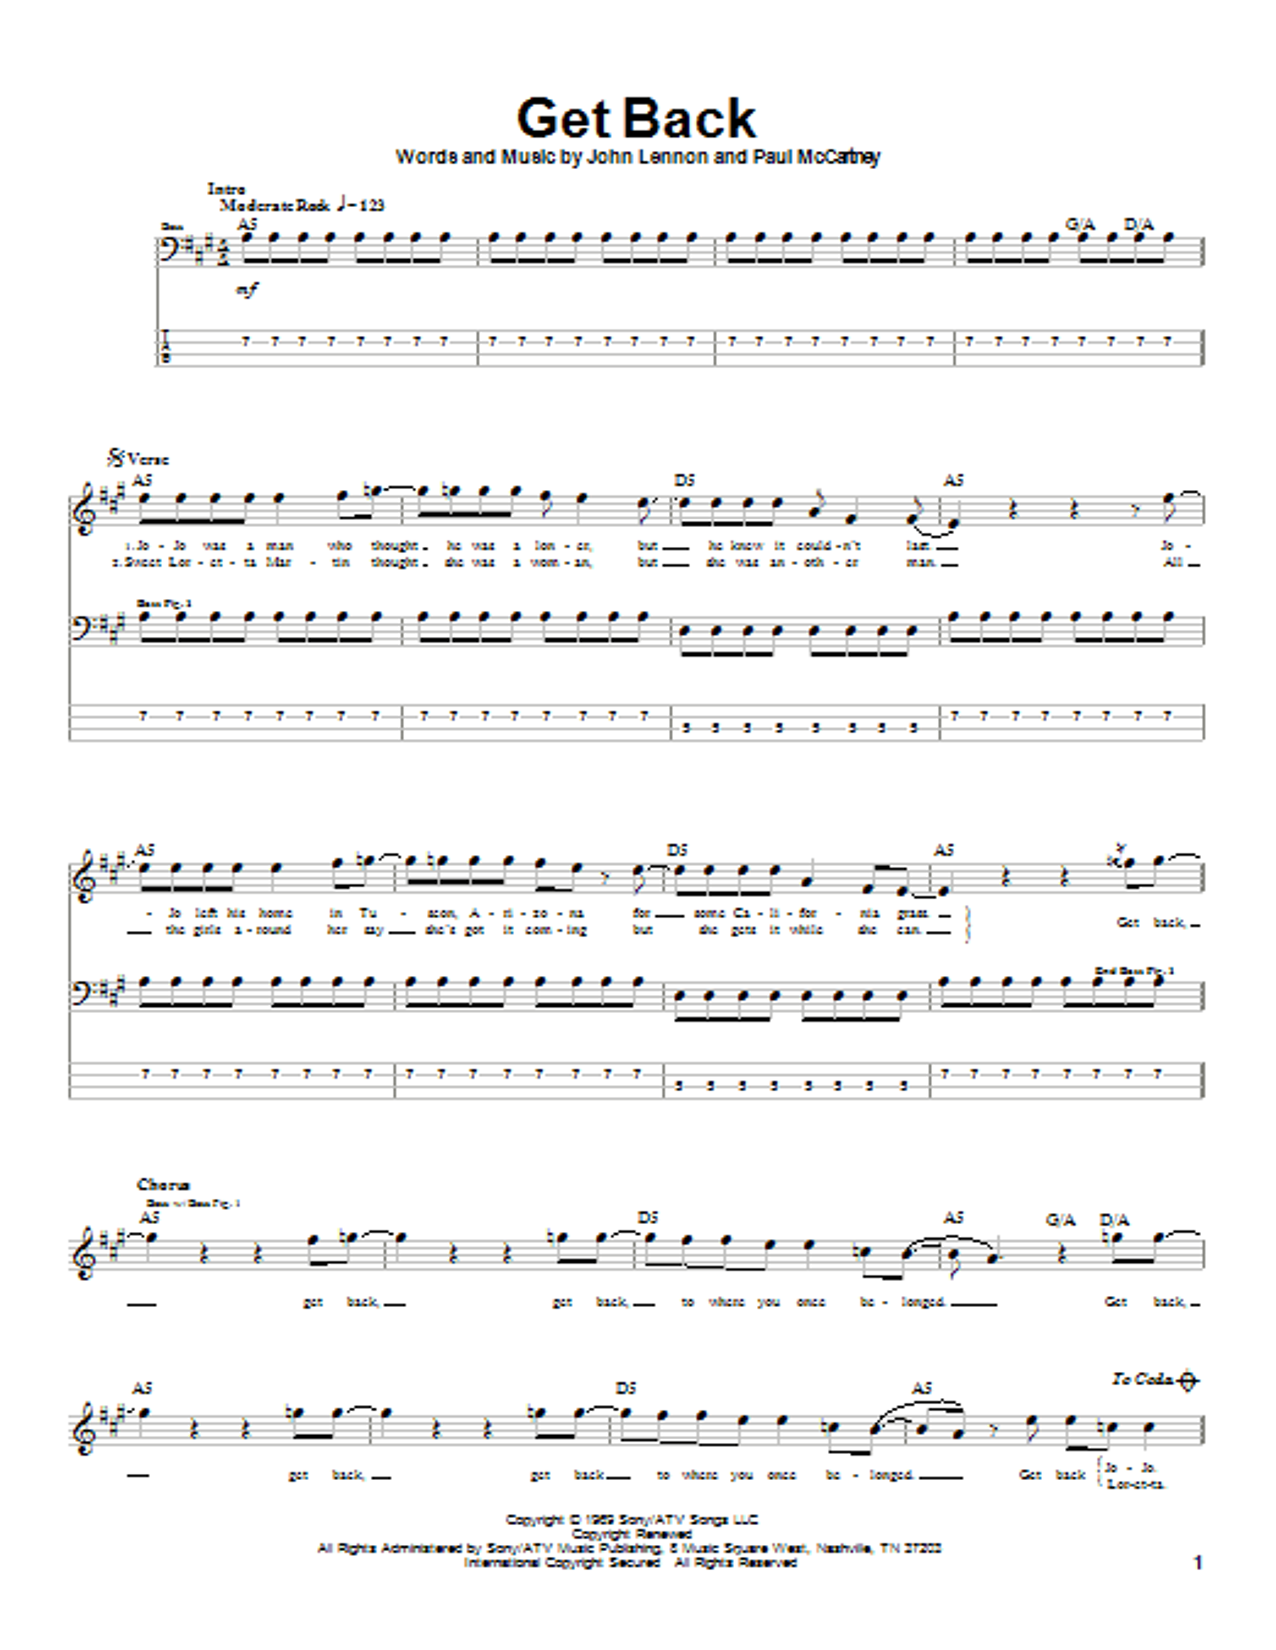 Tablature guitare Get Back de The Beatles - Tablature Basse